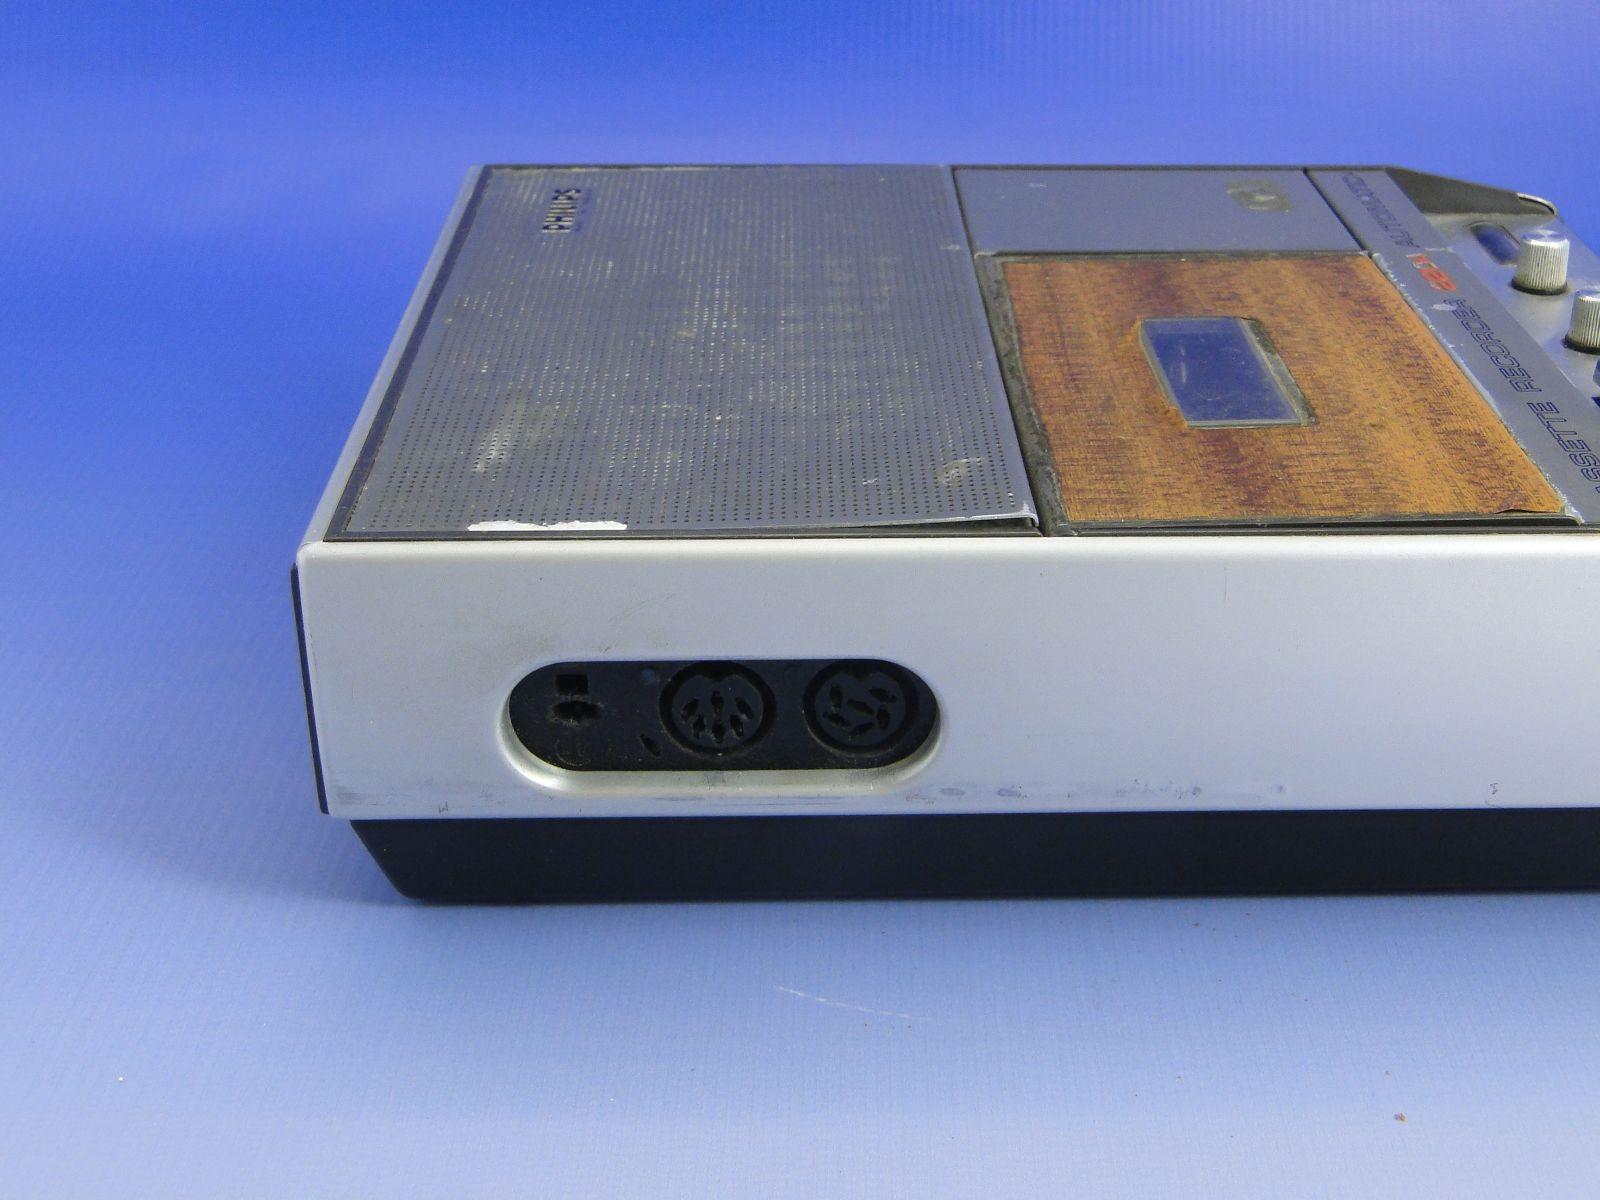 DSC07101.JPG (1600×1200)